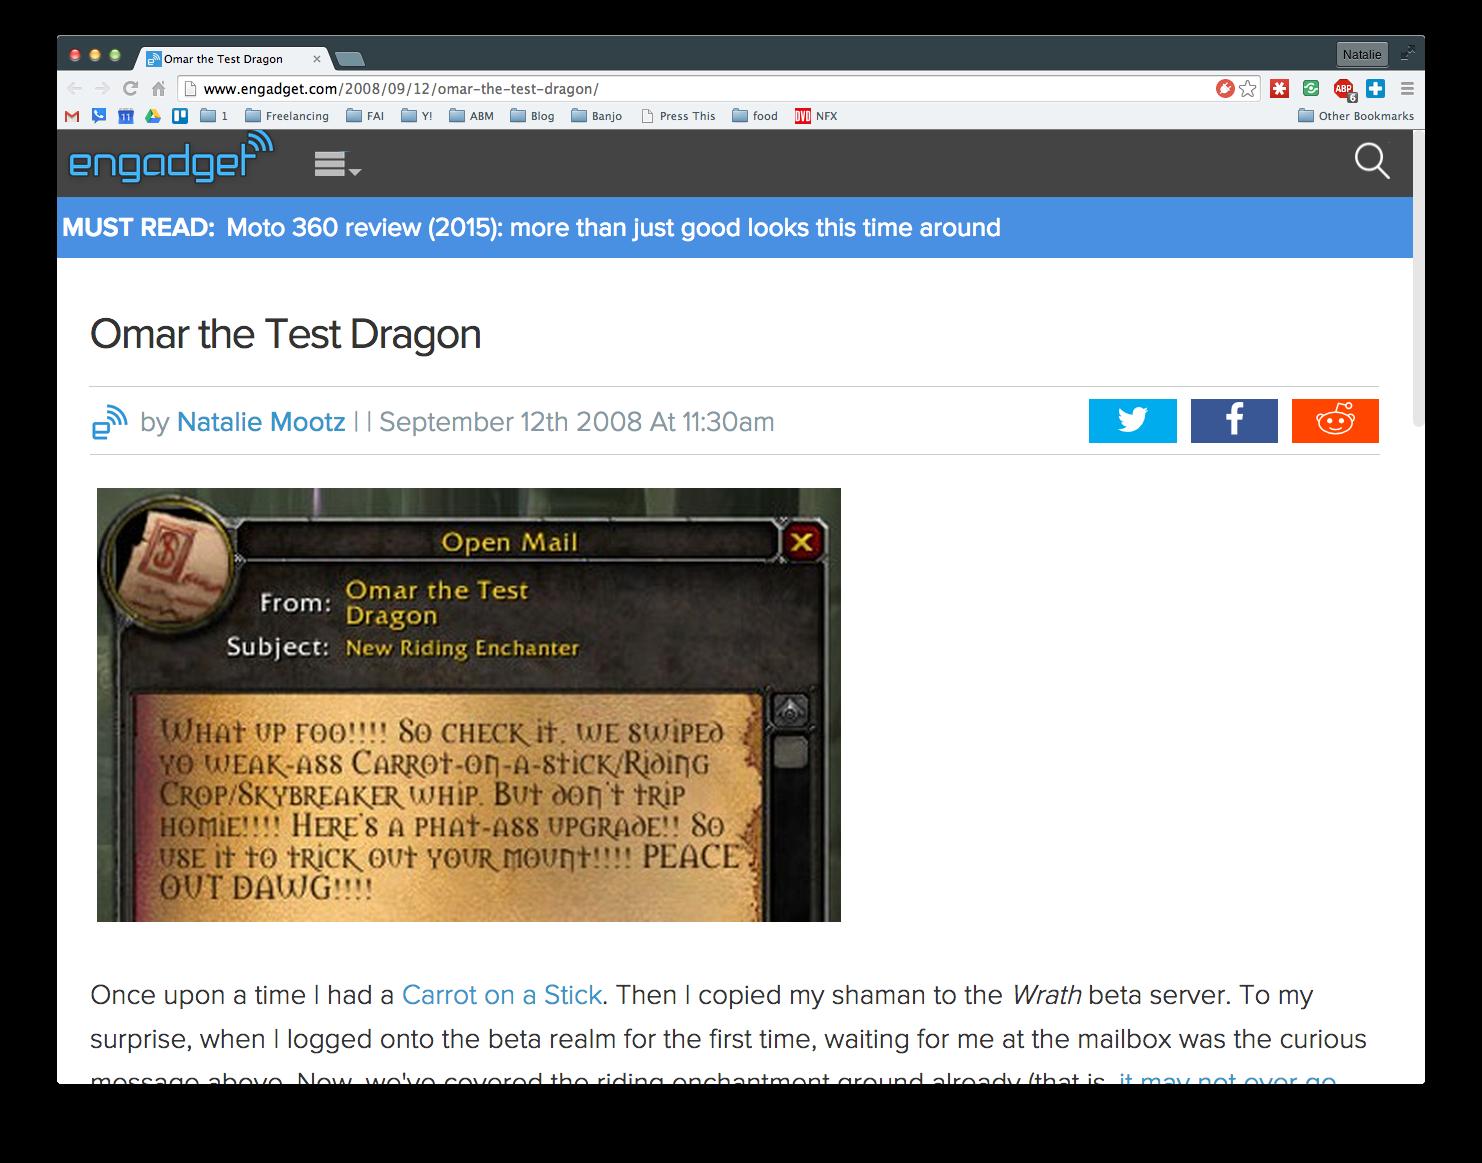 Omar the Test Dragon